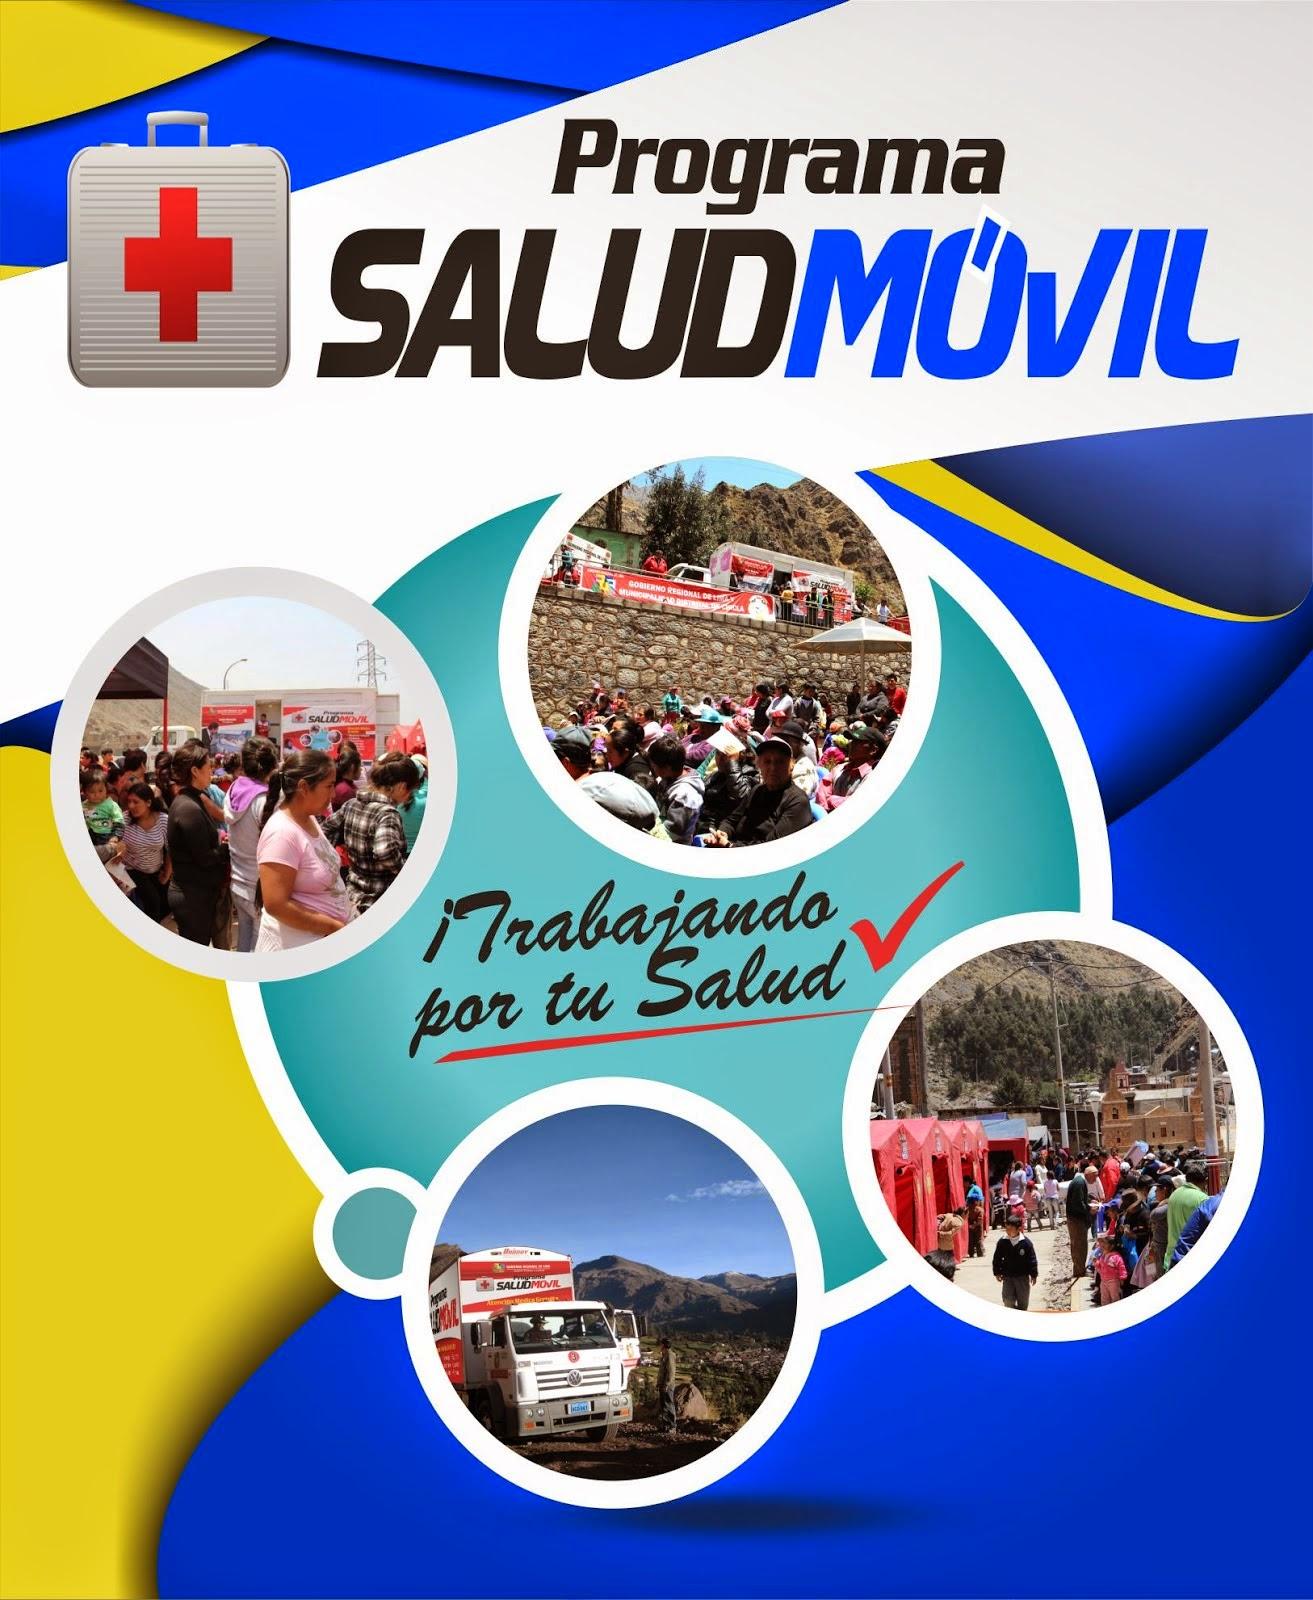 programa Salud Movil